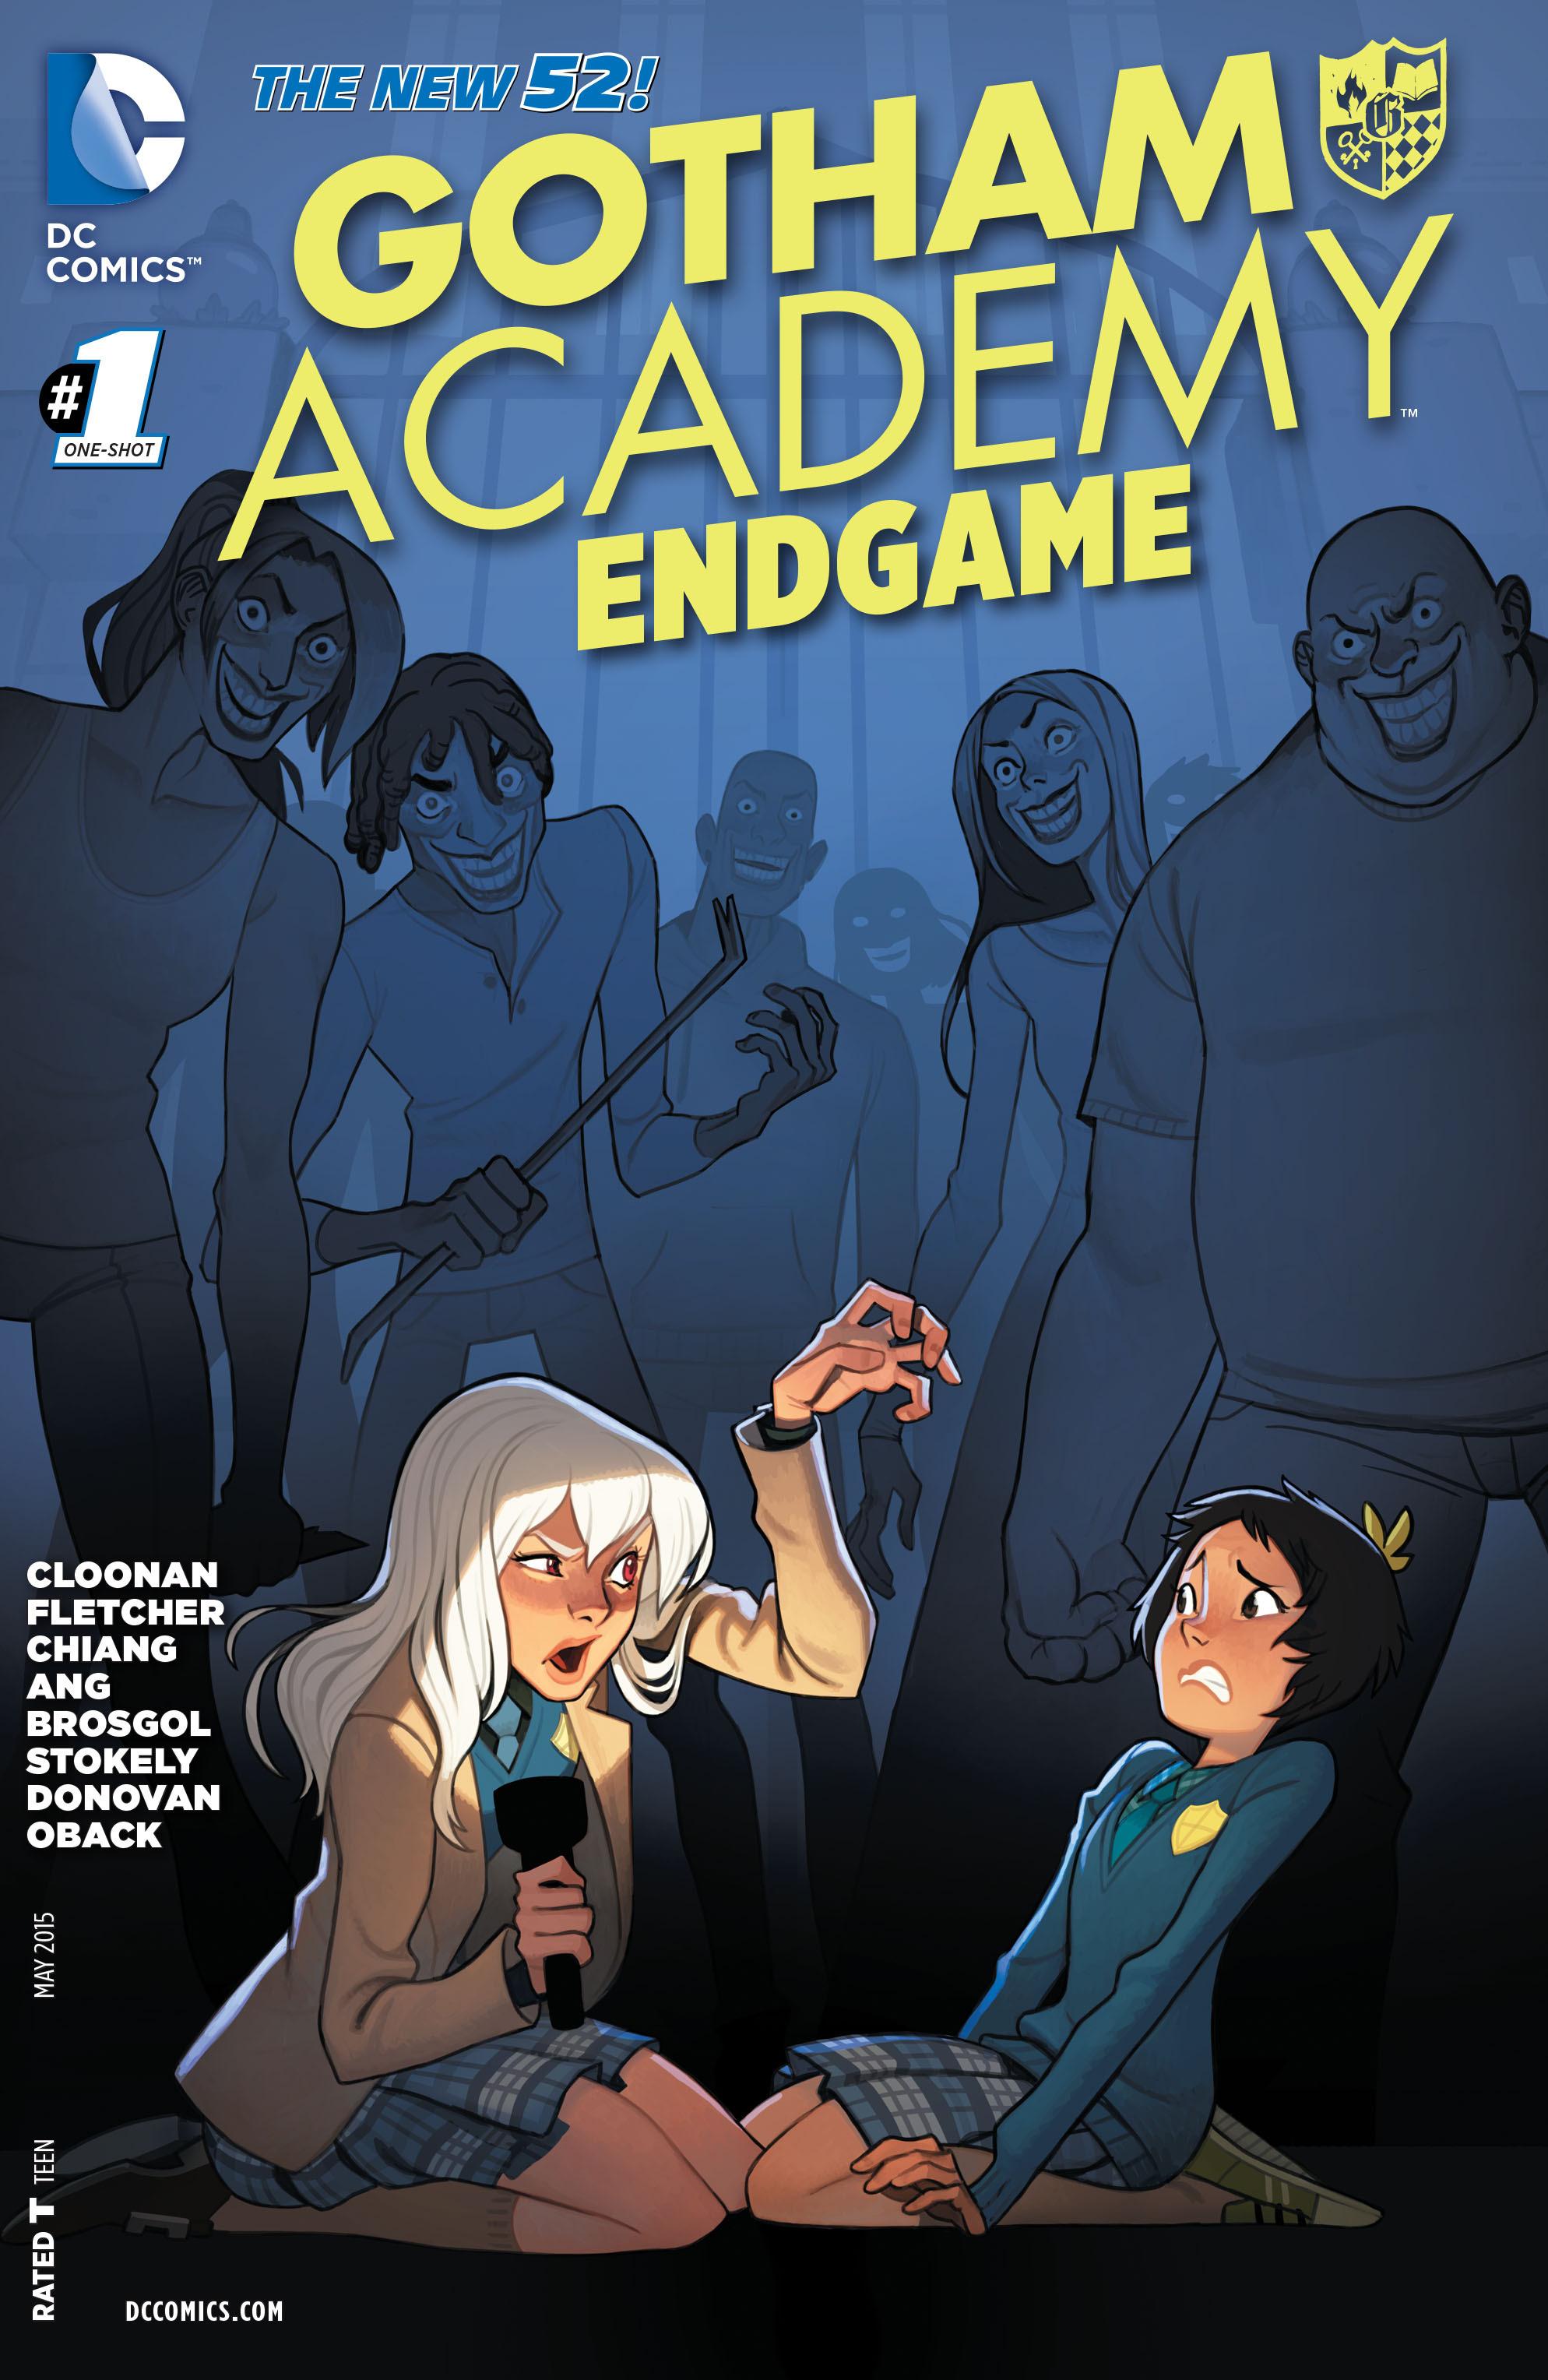 Gotham Academy: Endgame Vol 1 1